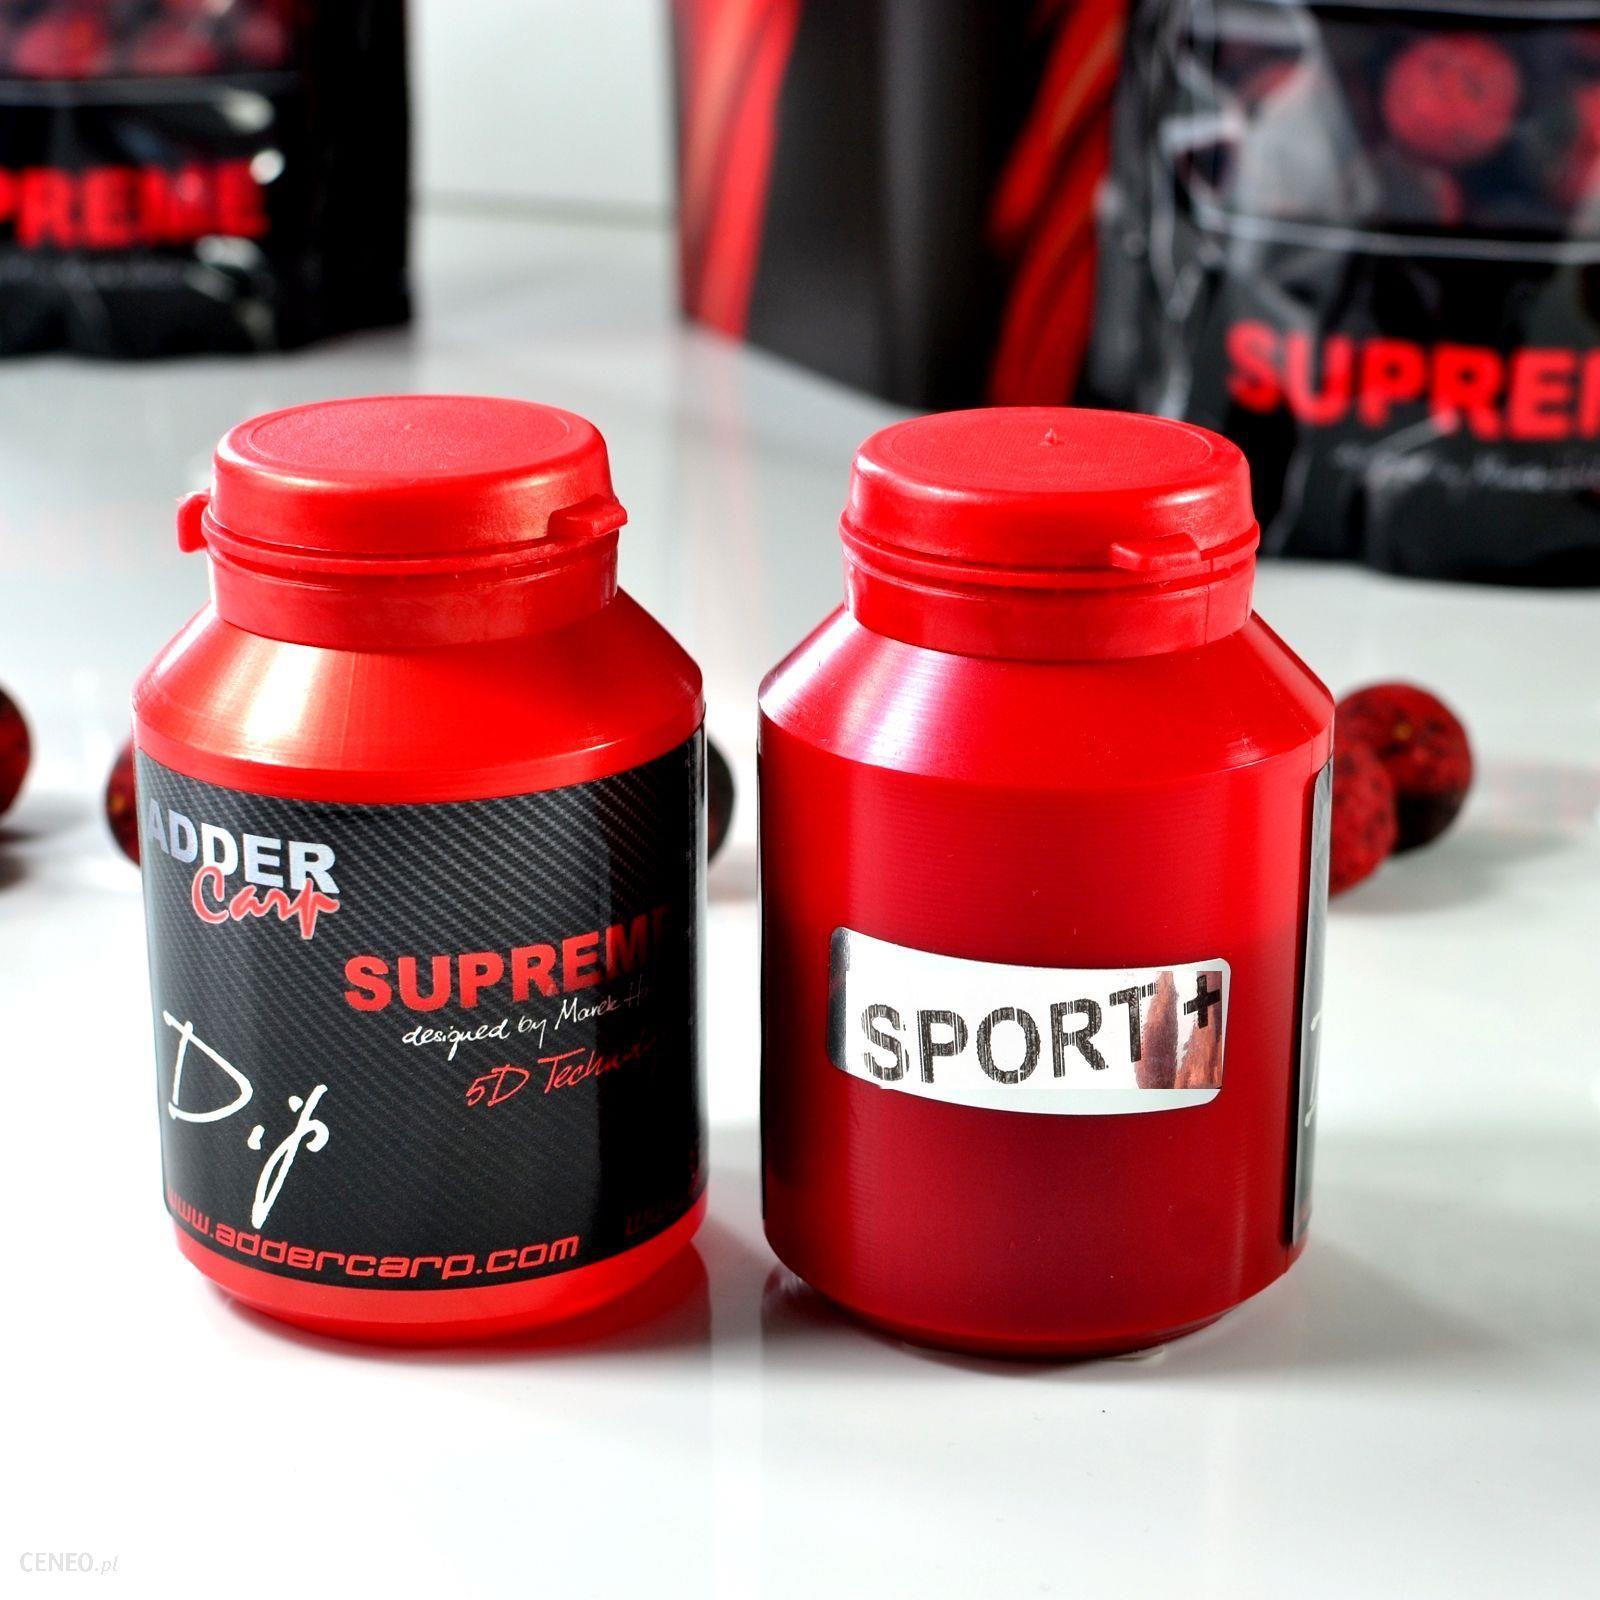 Ac Dip Płynny Supreme 5D Sportplus 120Ml Adder Carp